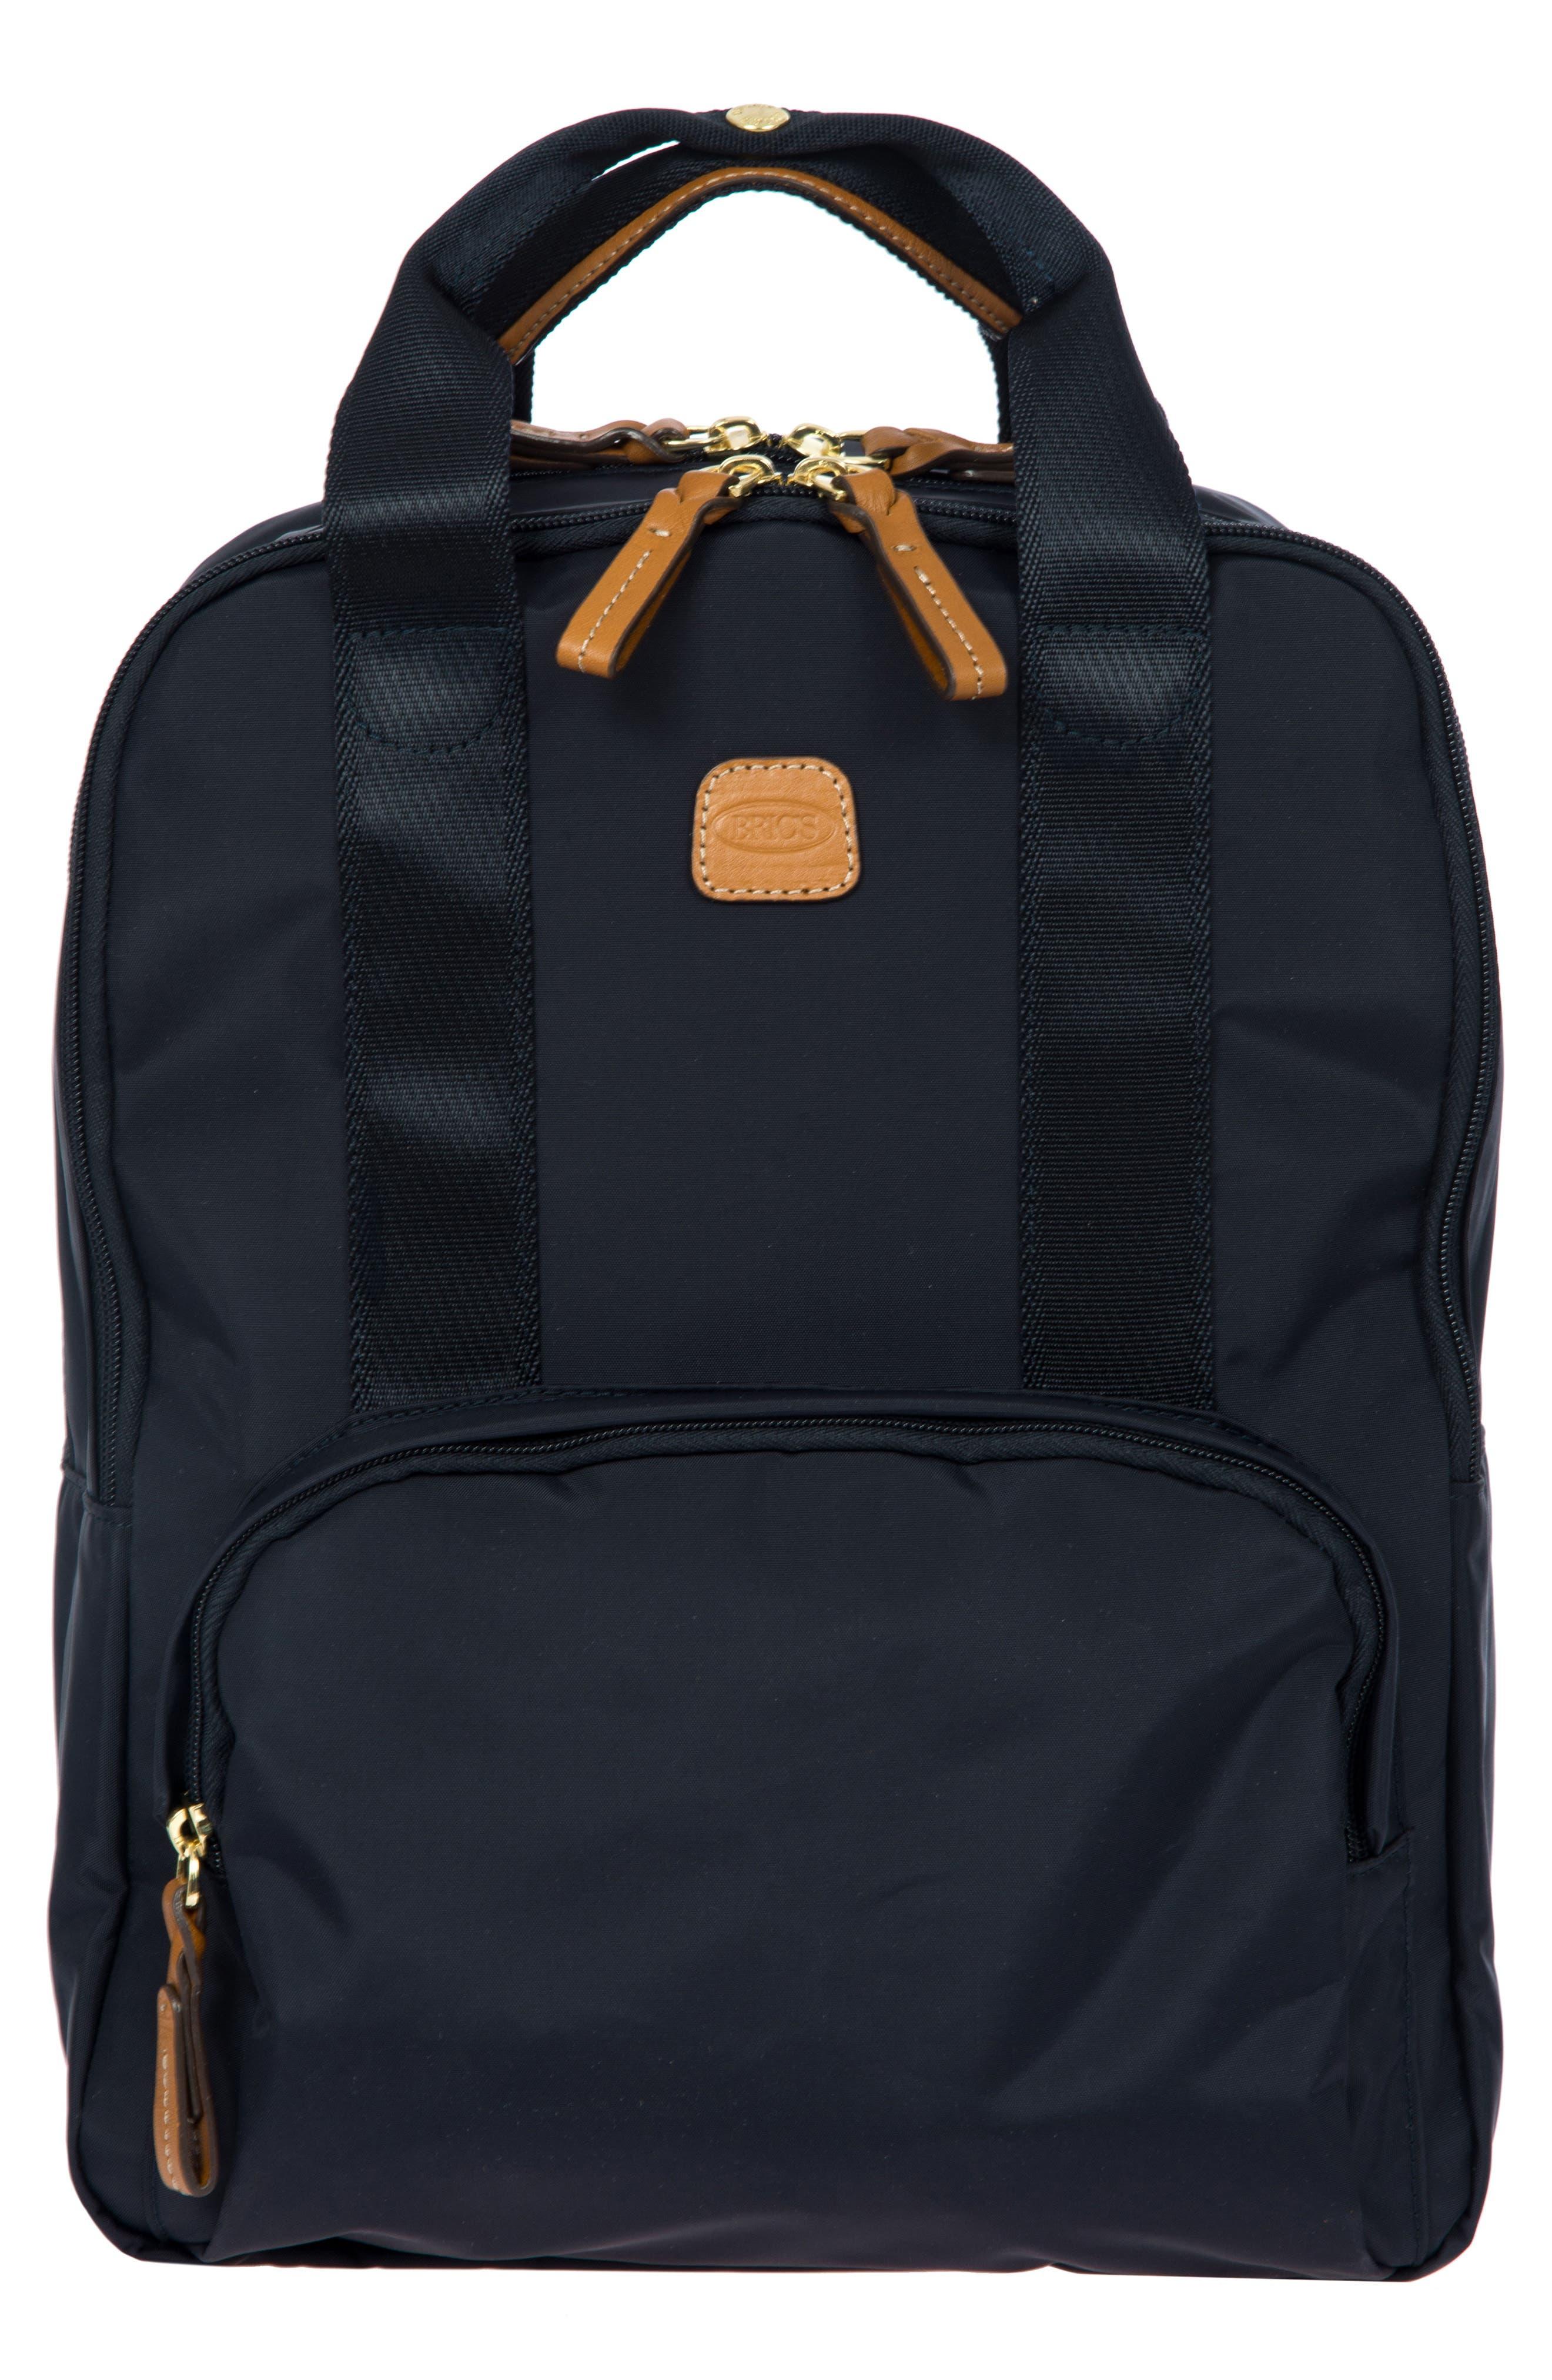 X-Bag Travel Urban Backpack,                         Main,                         color, Navy